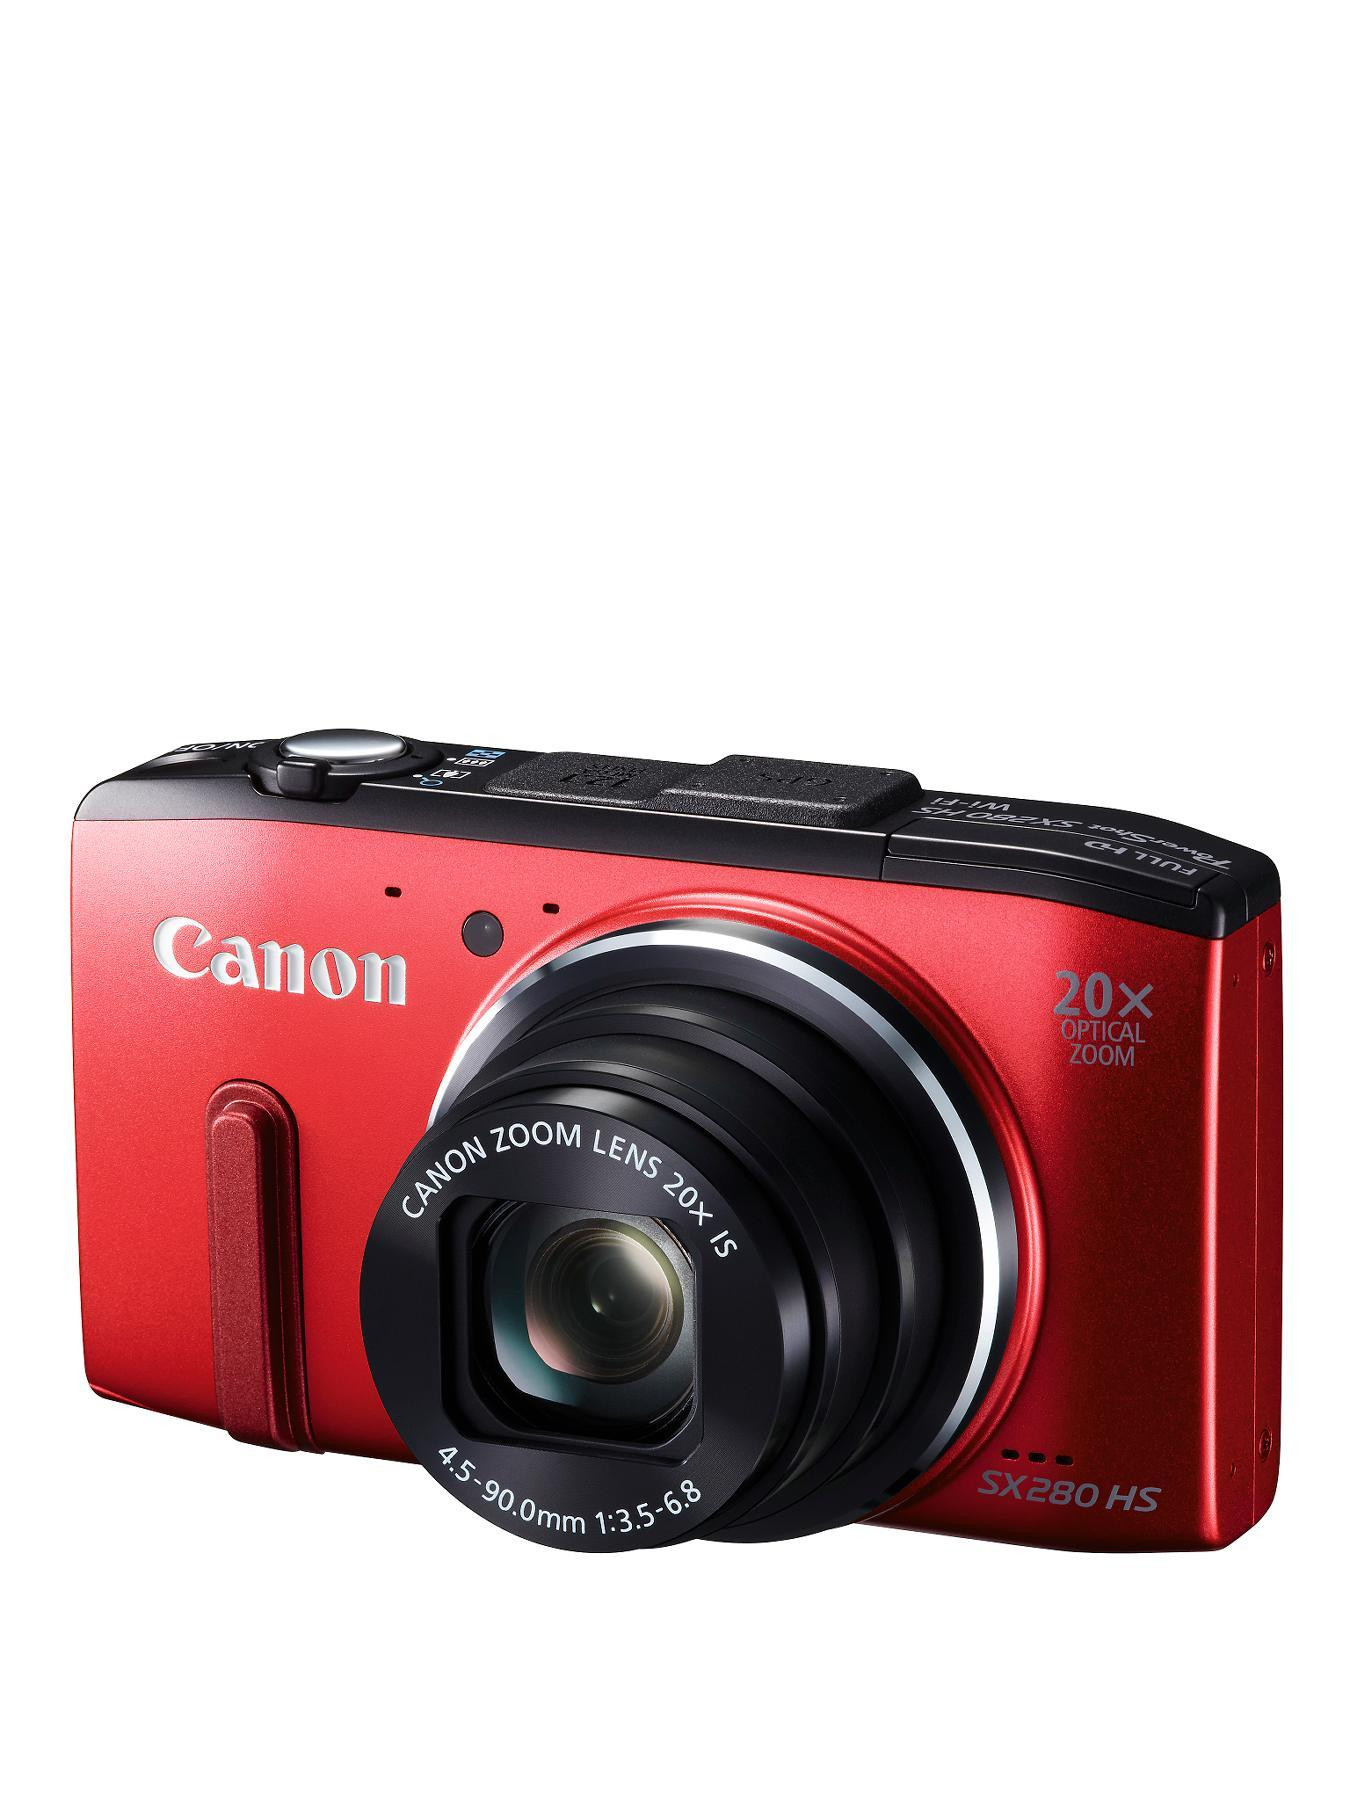 Canon PowerShot SX280 HS Compact Digital Camera